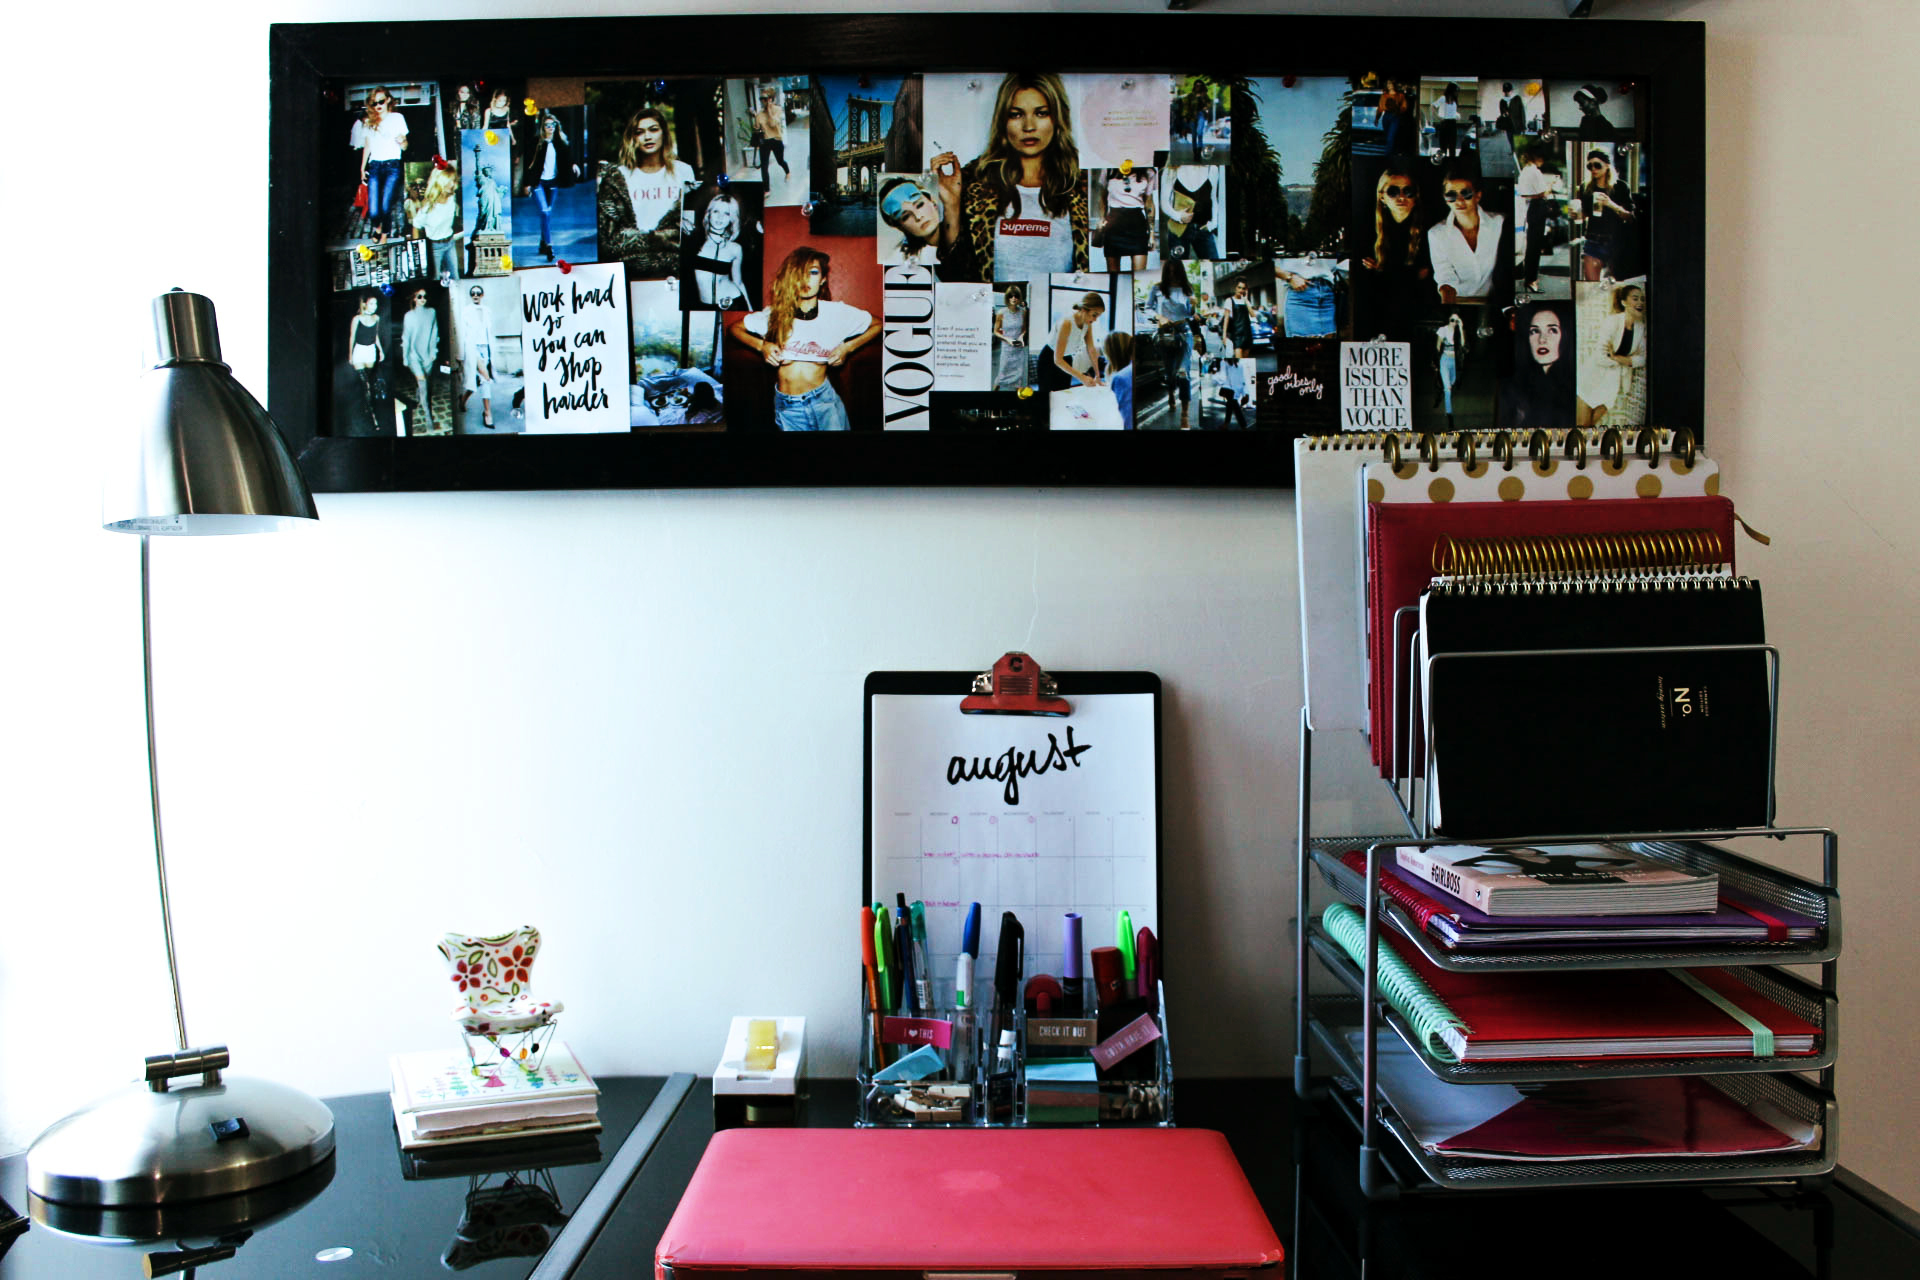 Diy decora tu oficina tablero inspiracional 8va avenida for Decora tu oficina